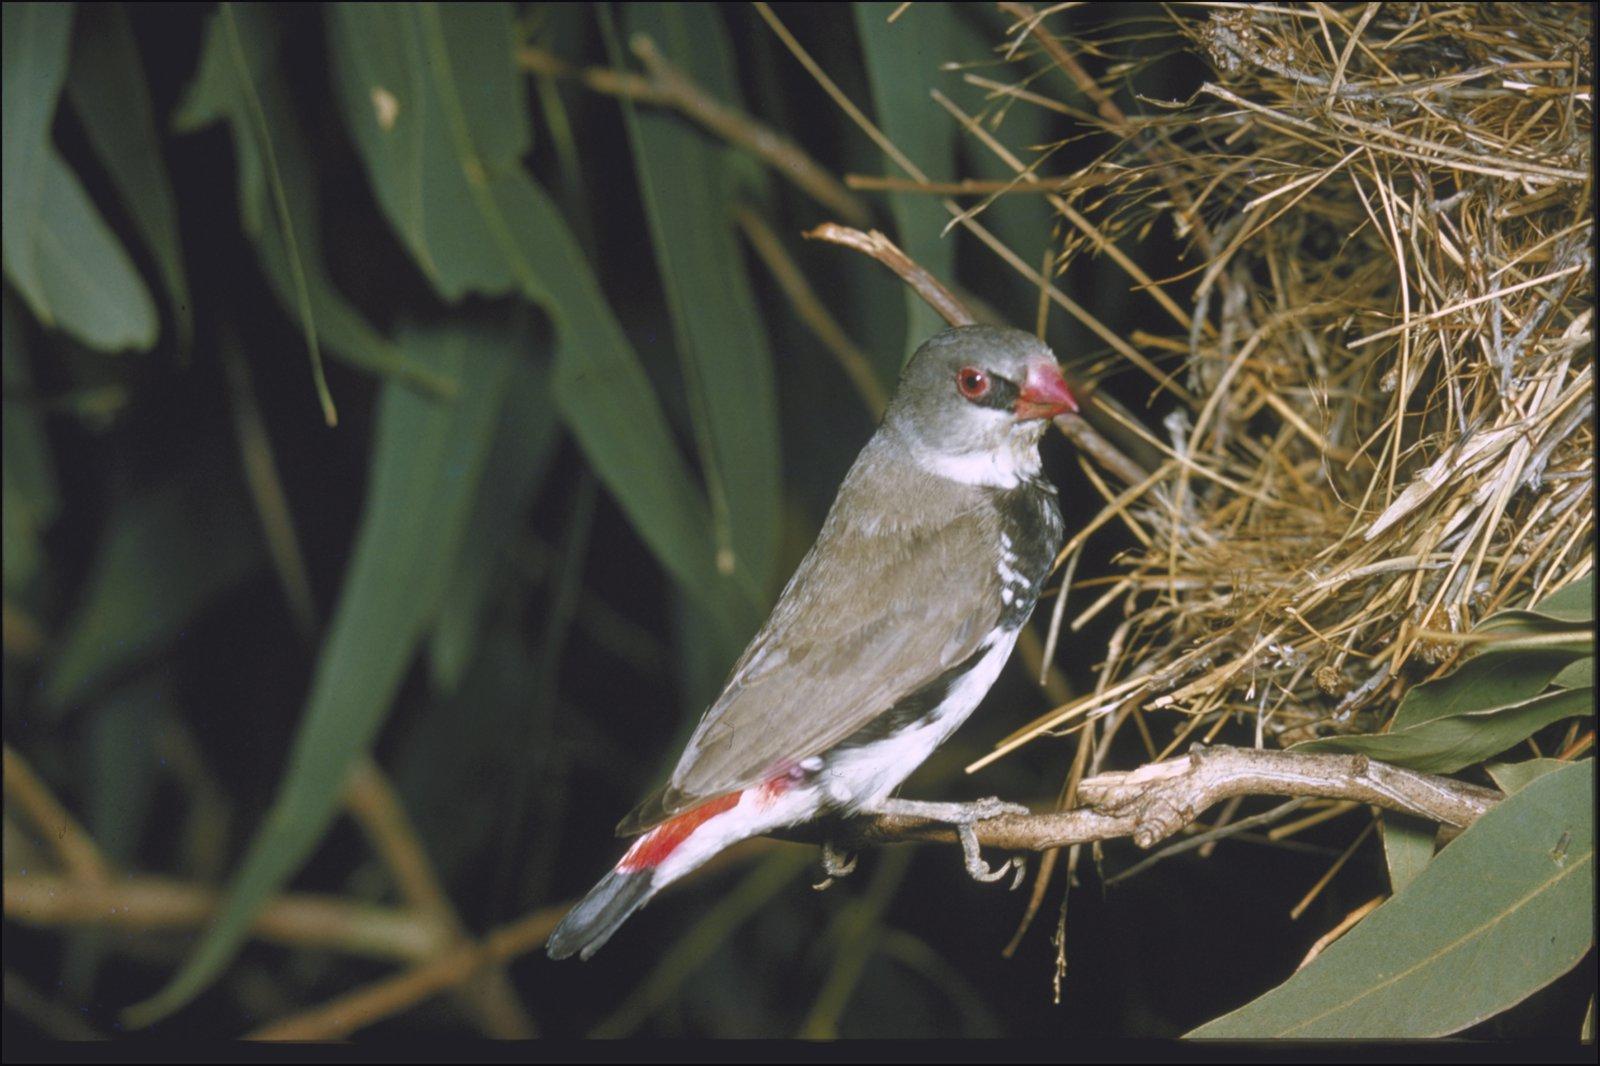 Stagonopleura guttata